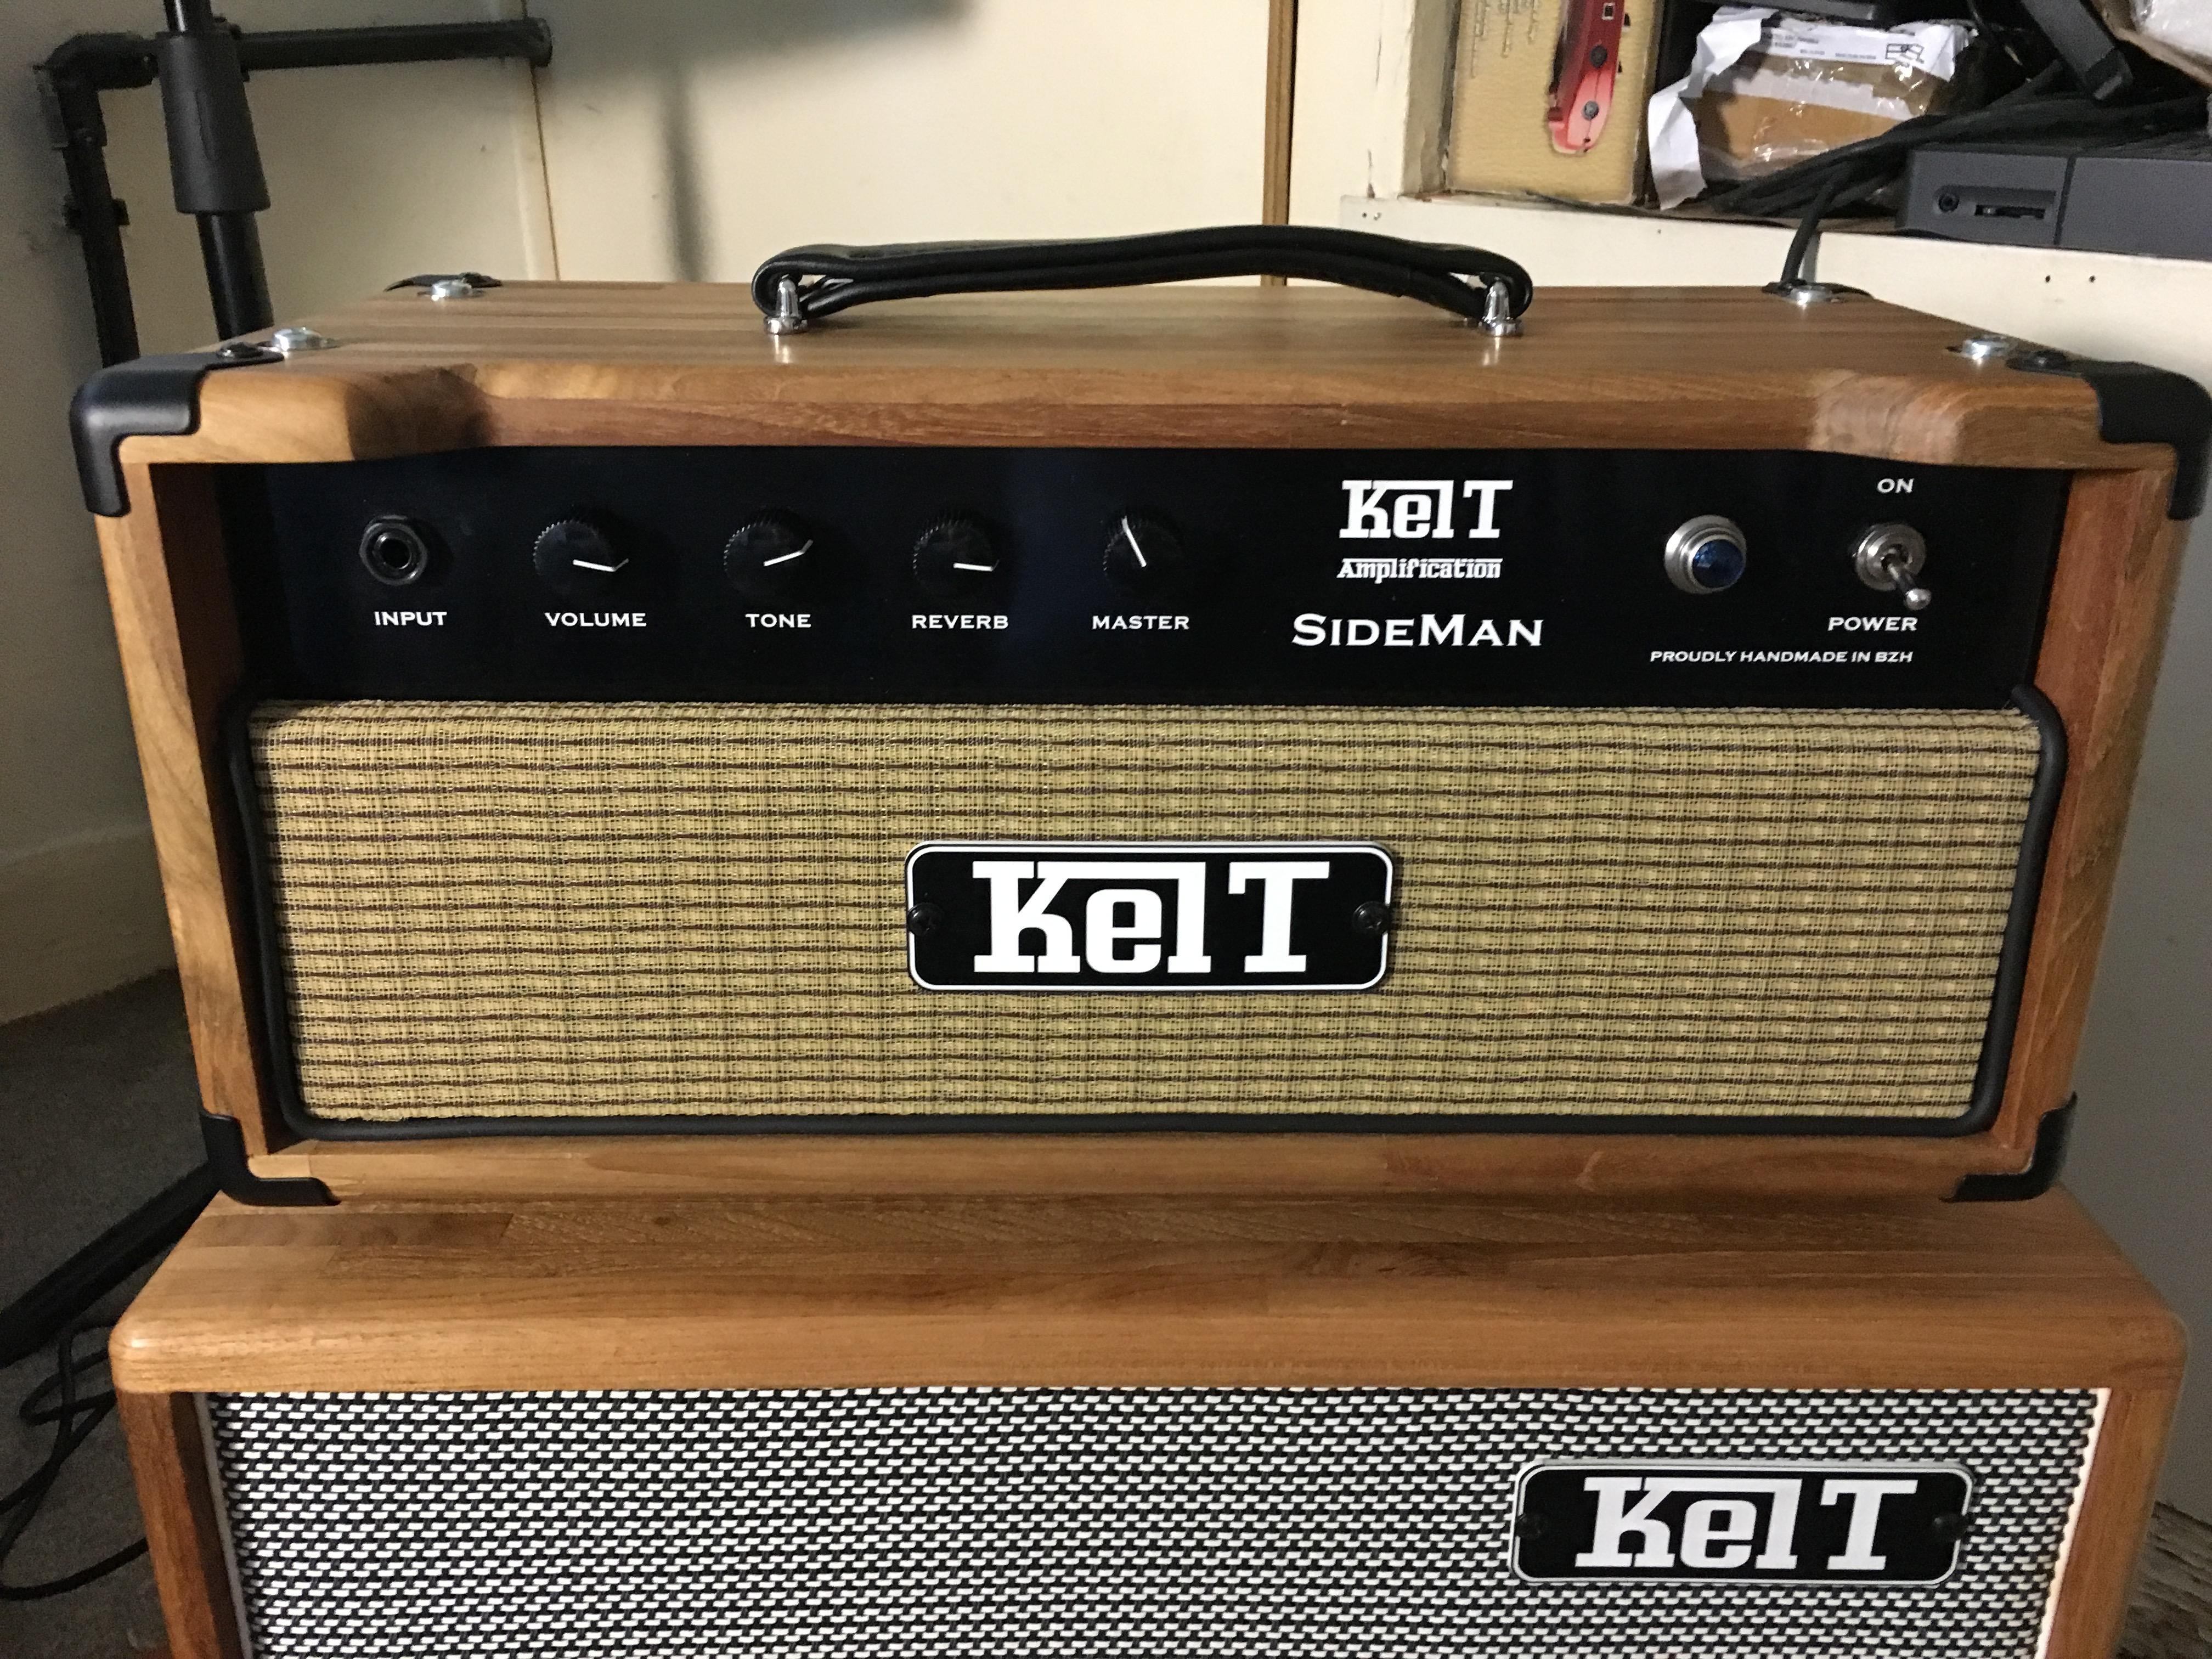 Test Ampli - Sideman Kelt Amplification - 100% lampes !